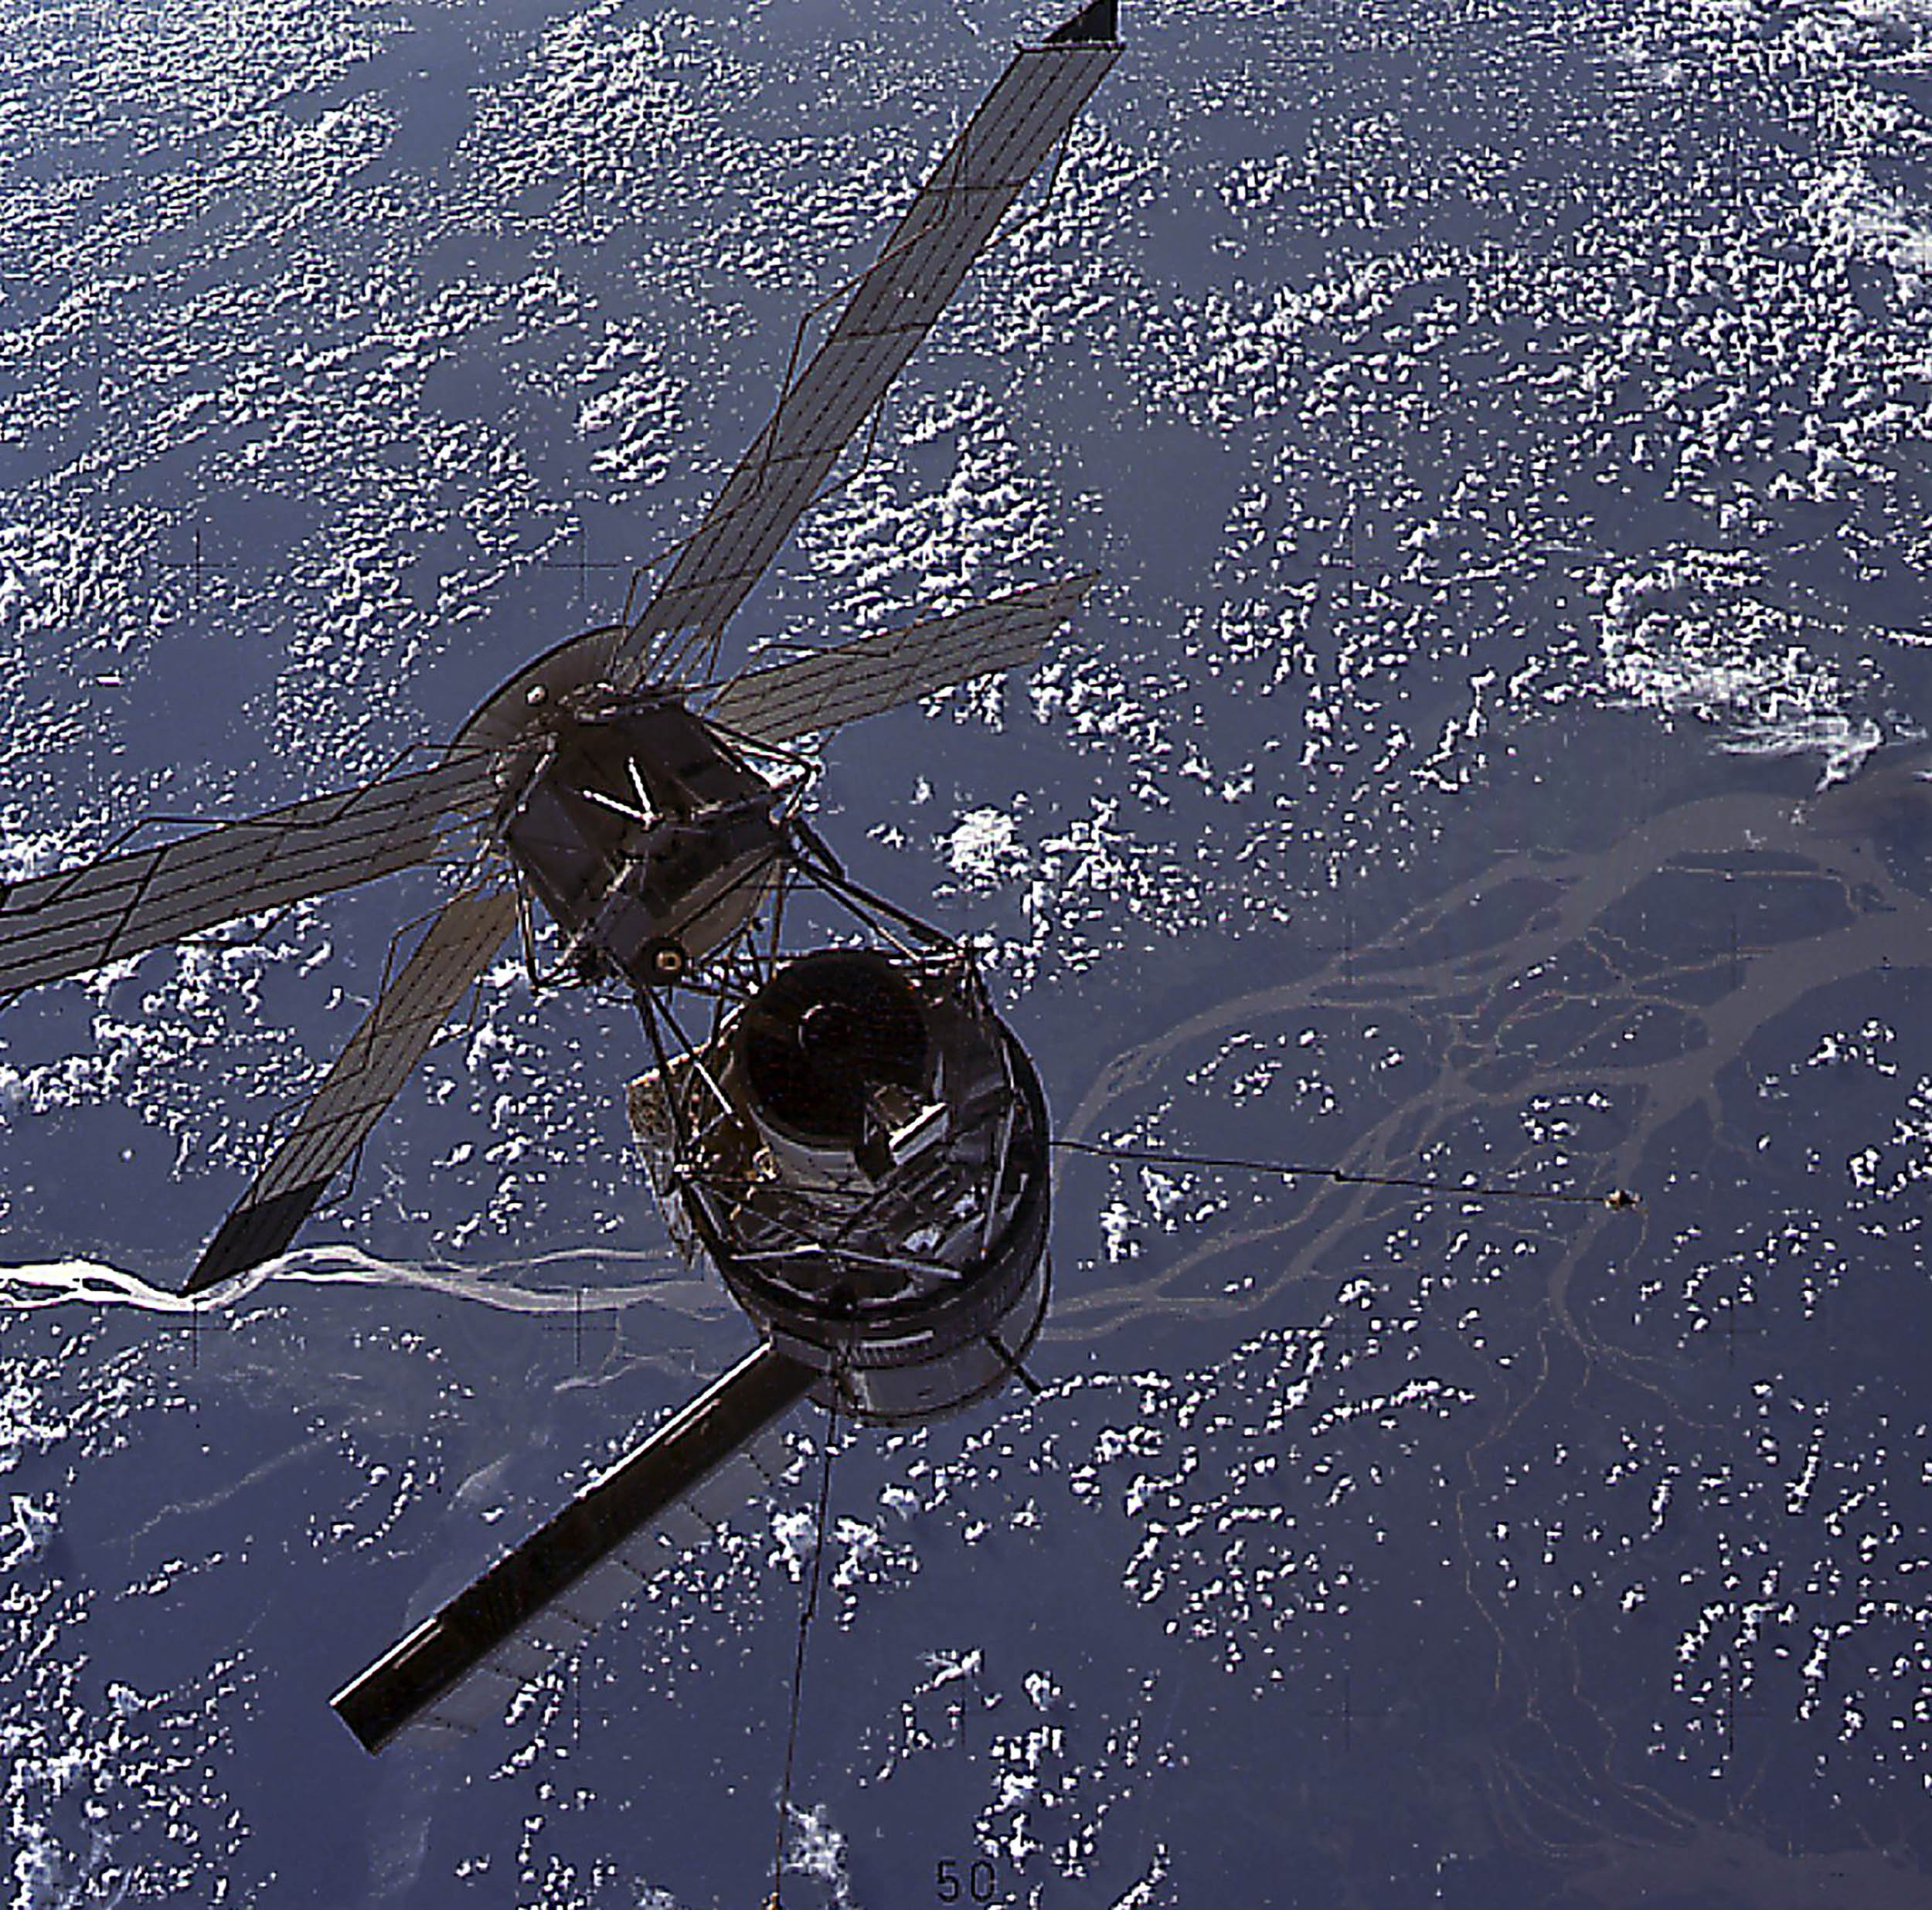 Skylab Space Station Crash 1979 - Pics about space